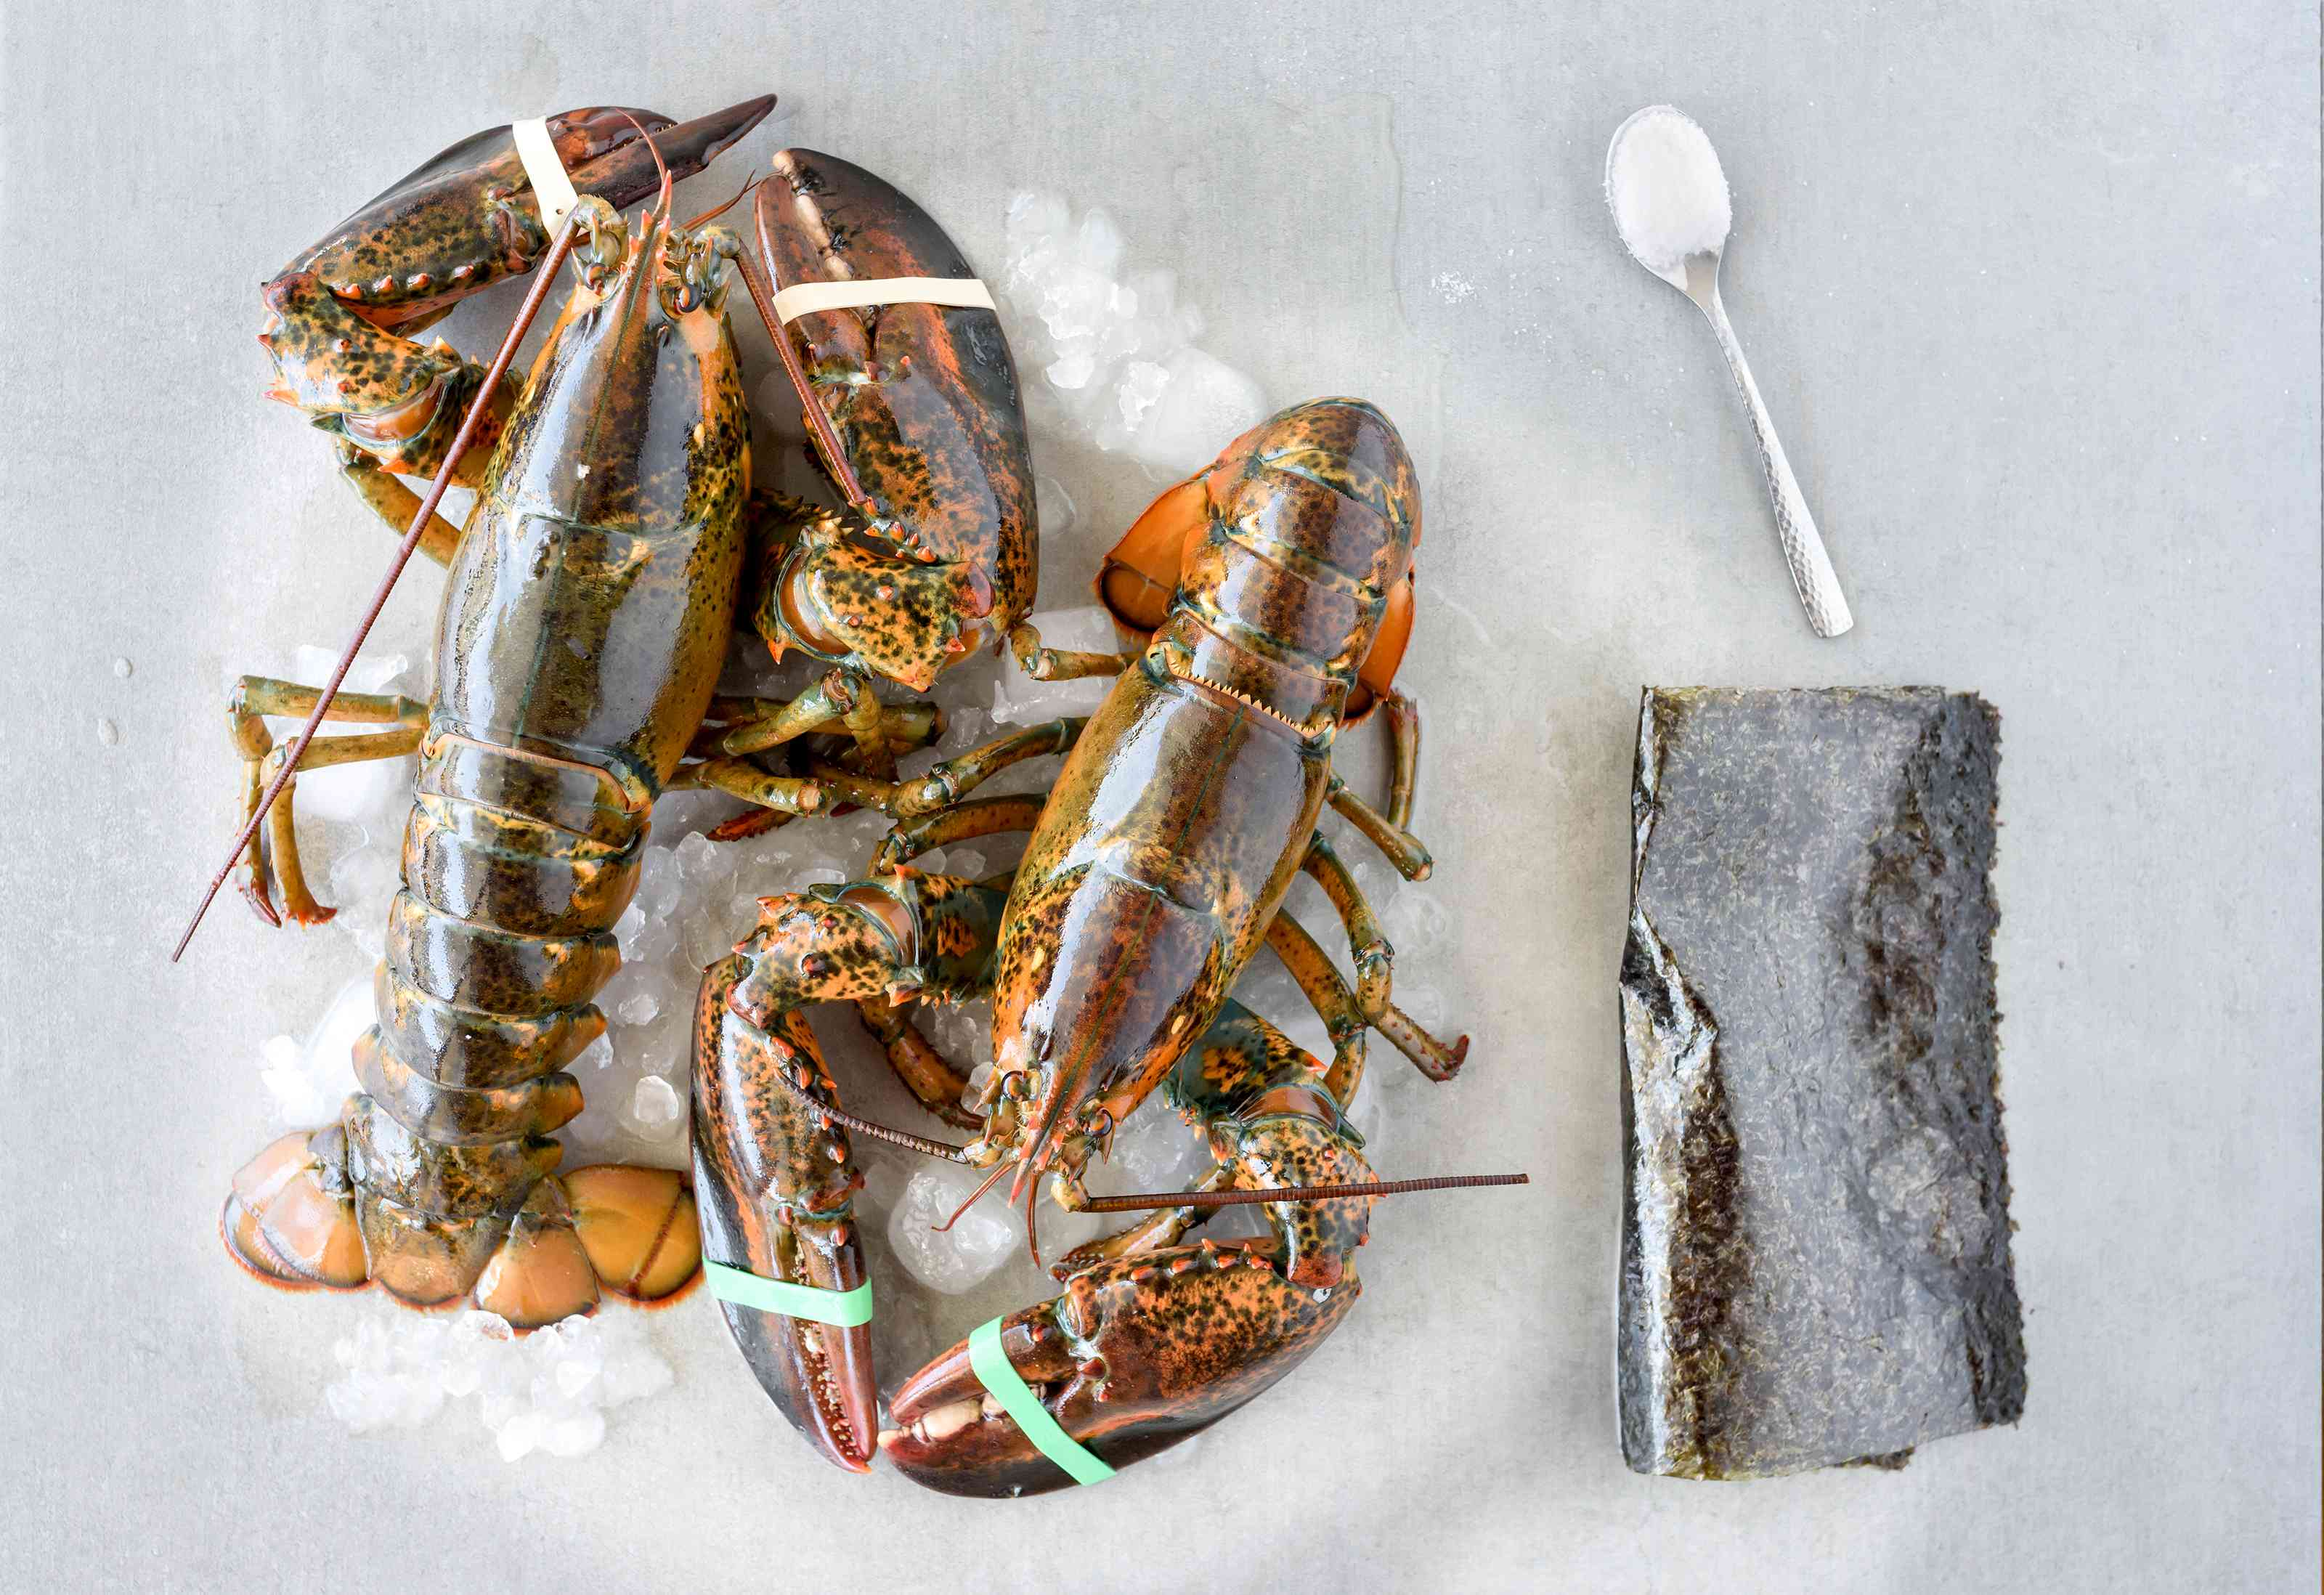 Ingredients for lobster